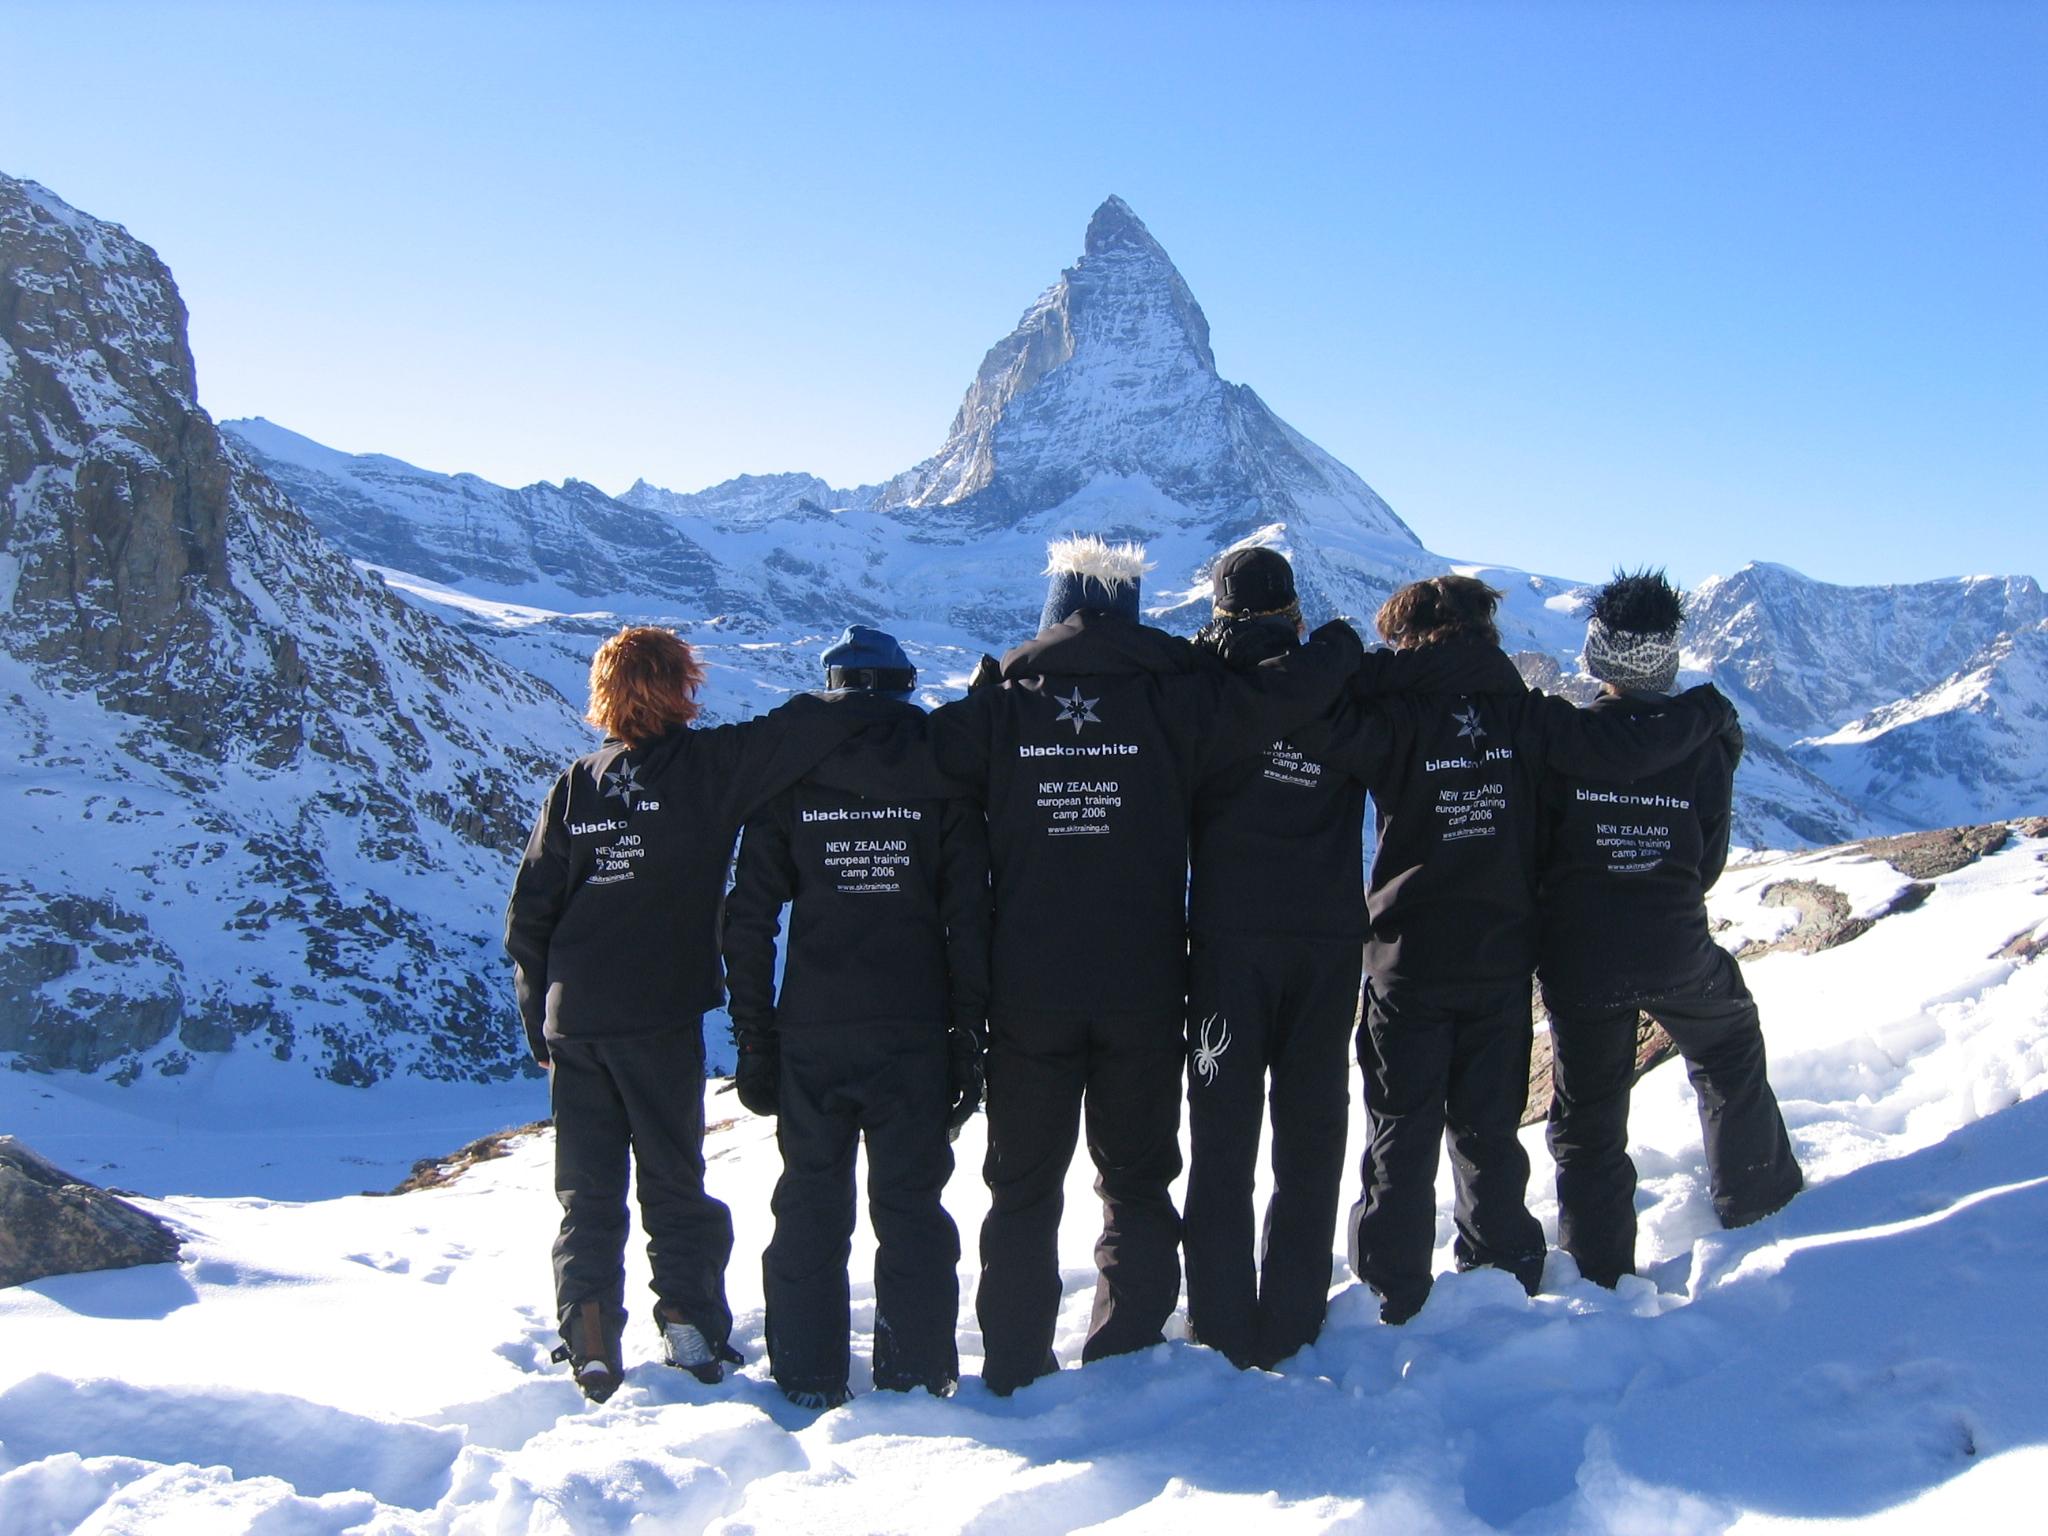 New Zealand European Training Camp sporting the blackonwhite logo in Zermatt, Switzerland, 2006.